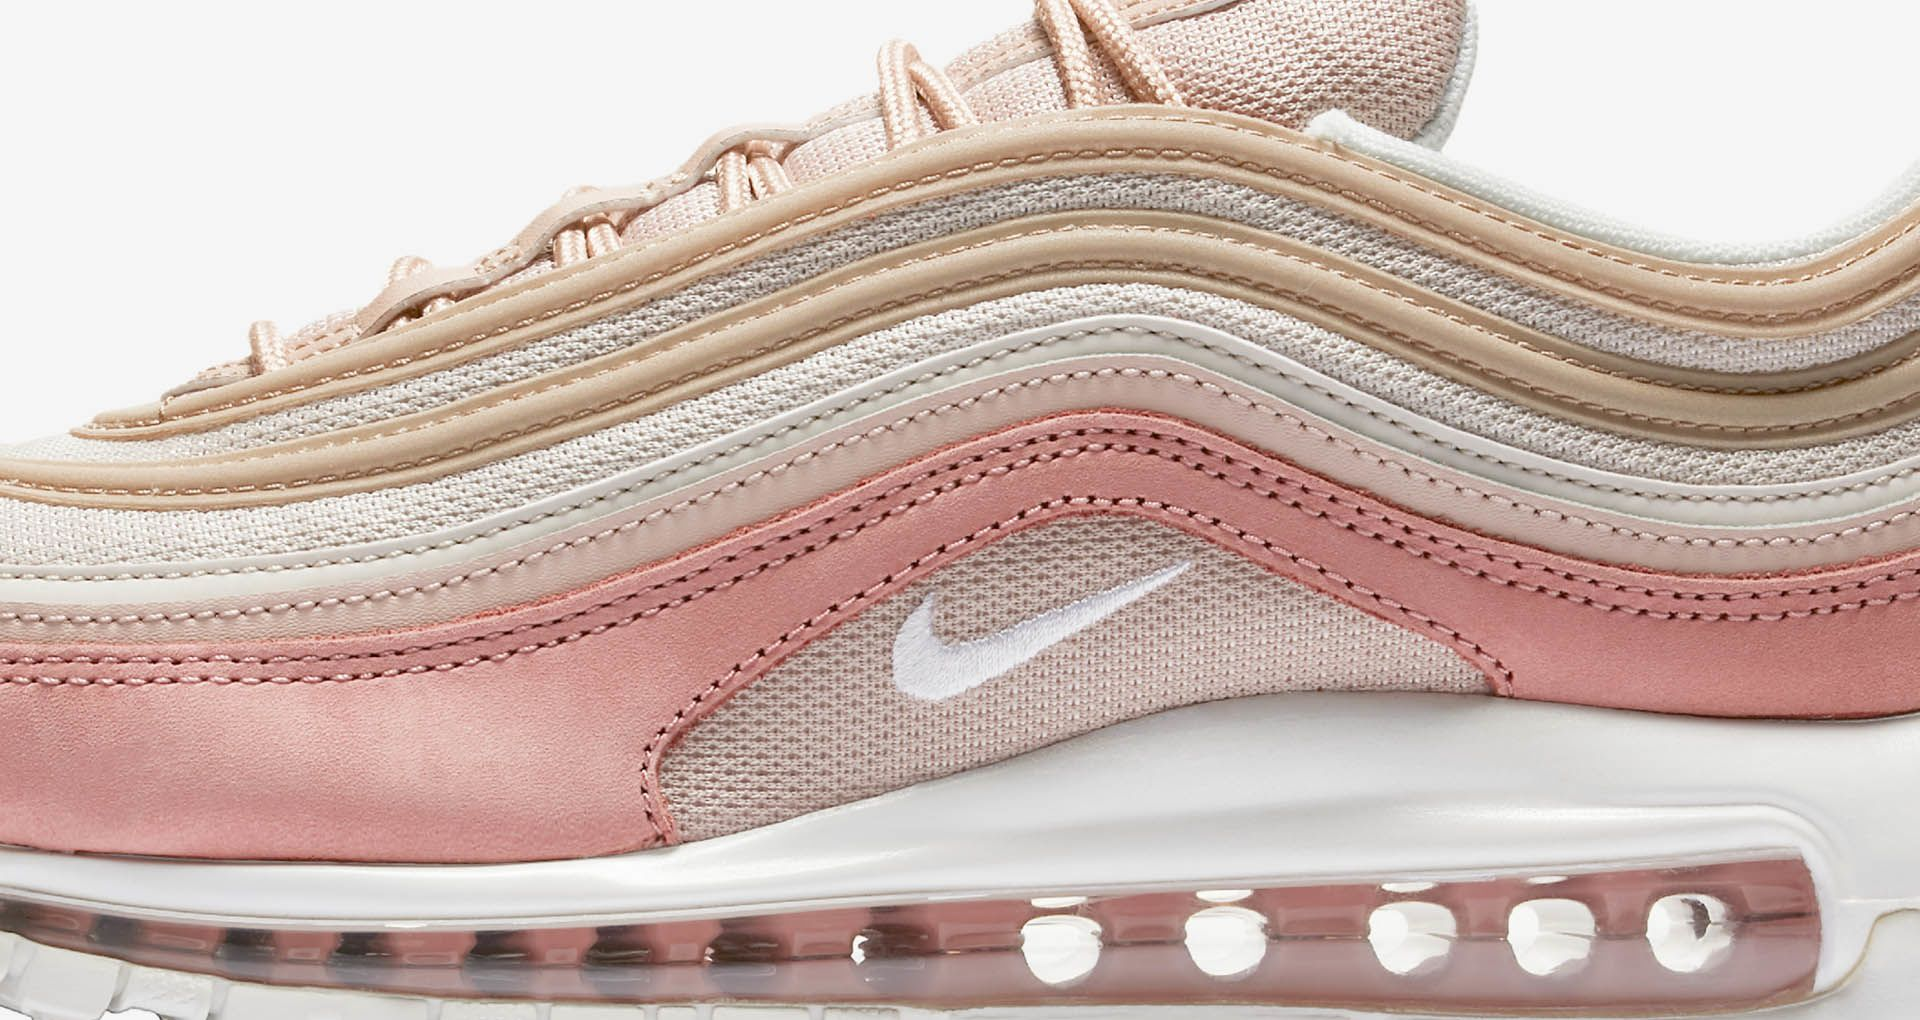 Nike Air Max 97 Premium 'Particle Beige' Release Date. Nike